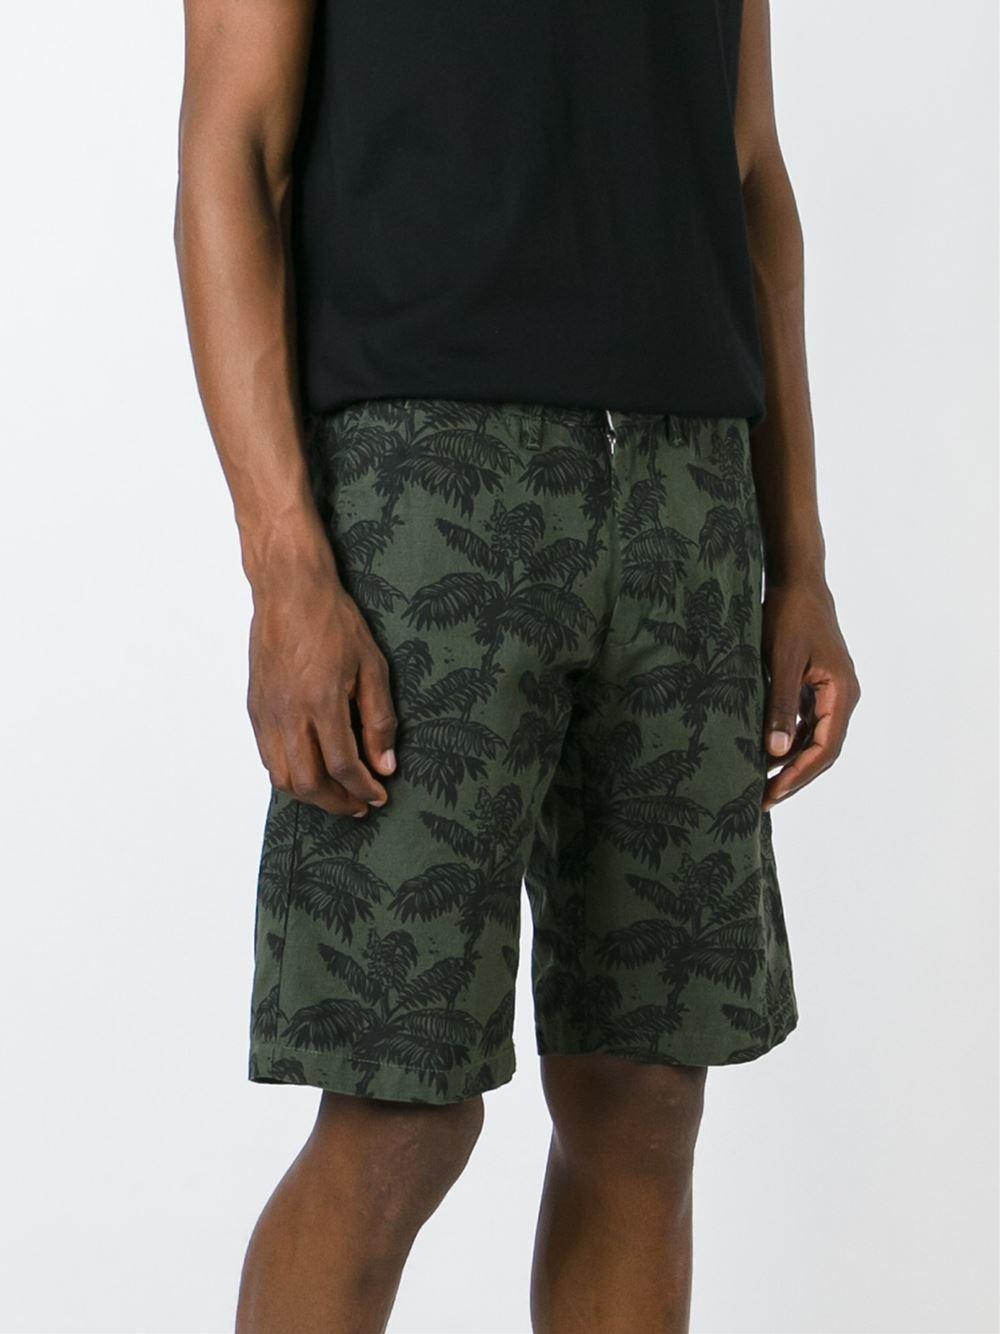 Carhartt Johnson Palm Tree Print Bermuda Shorts In Green